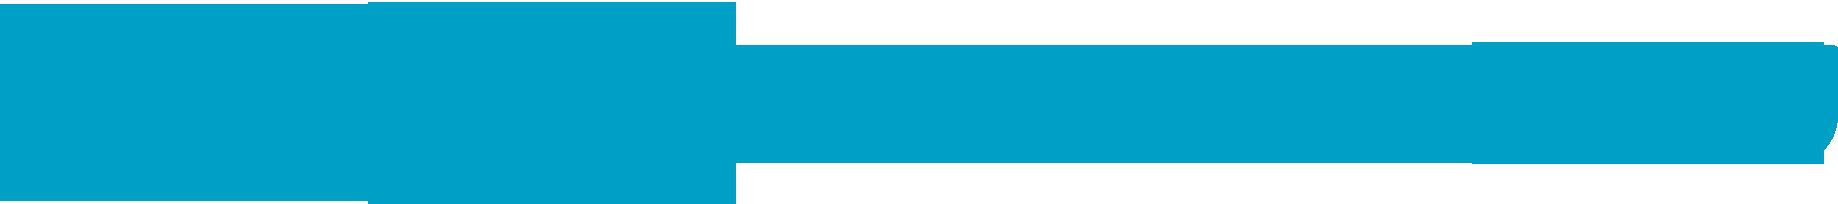 Logo waveparks